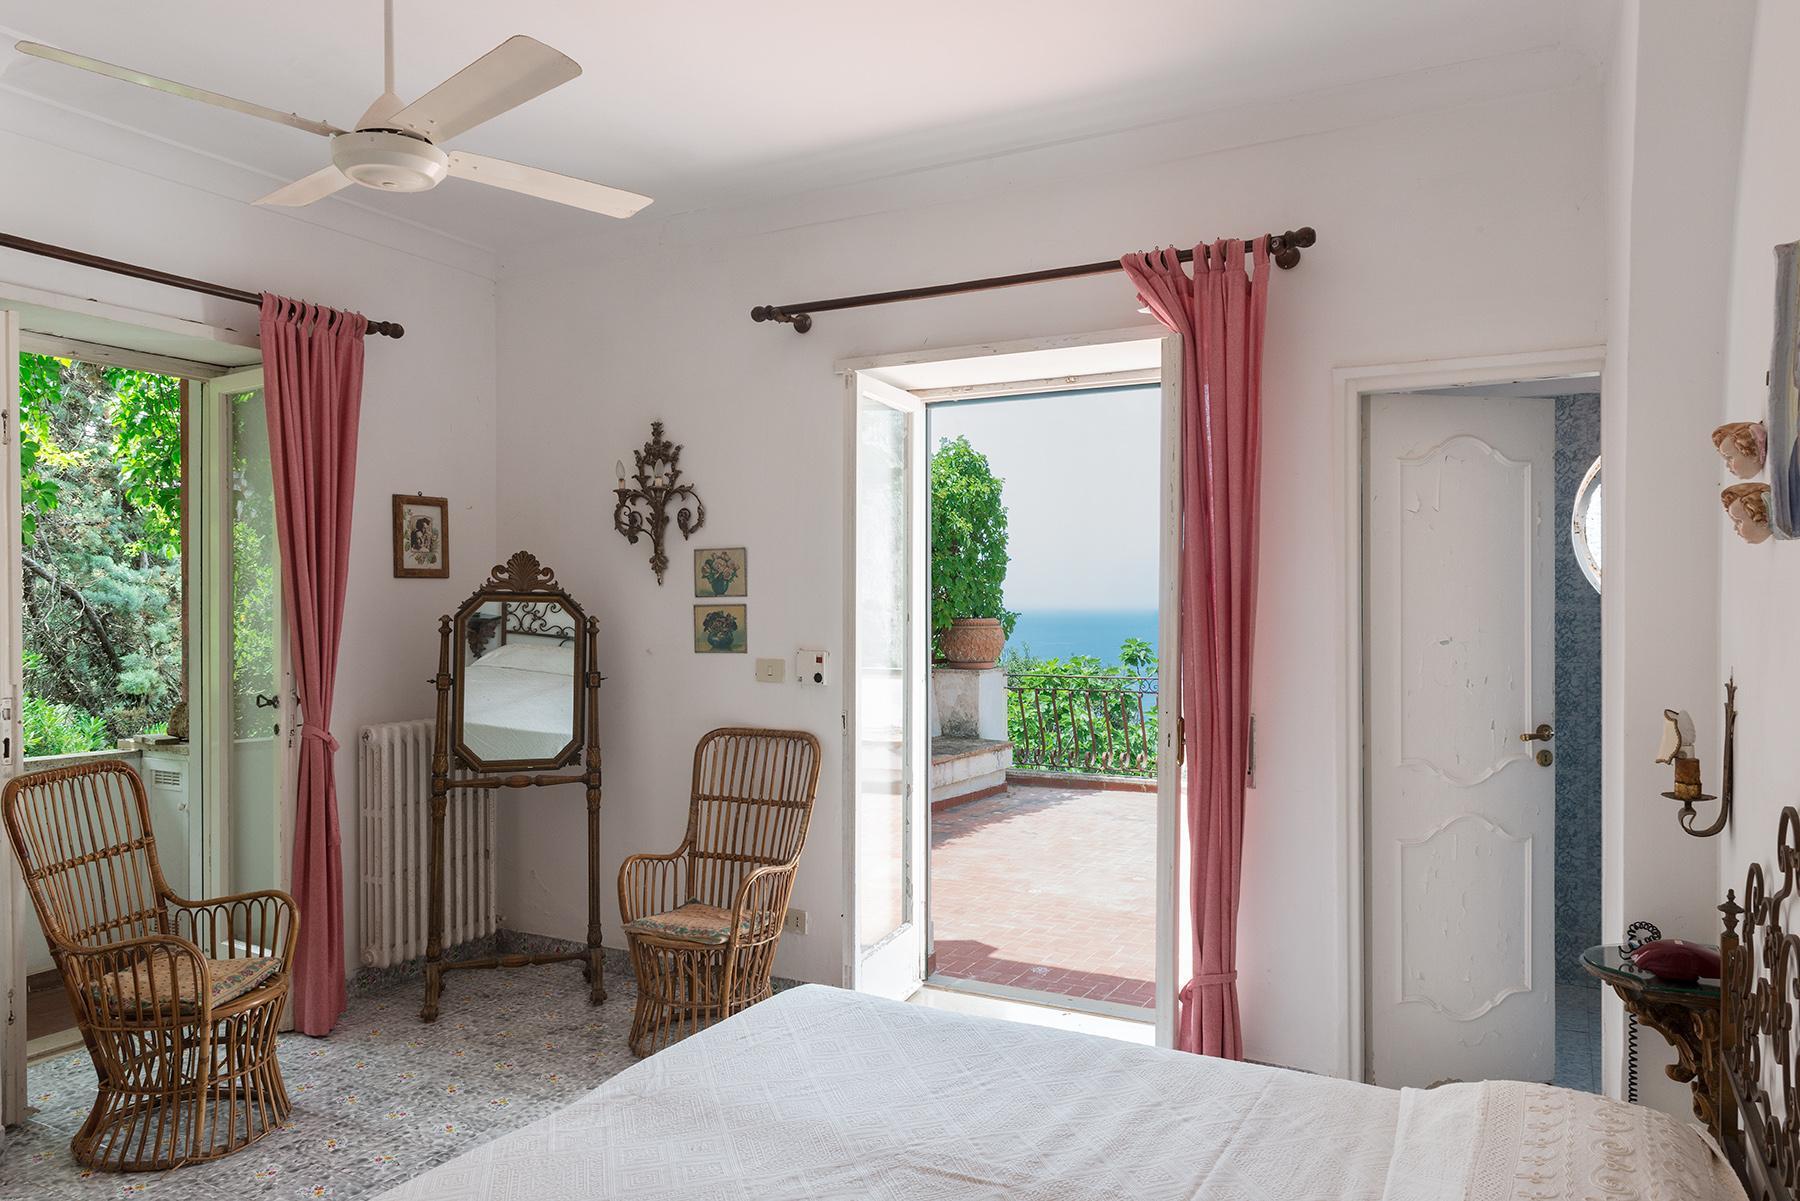 Capri岛中心的别墅 - 11